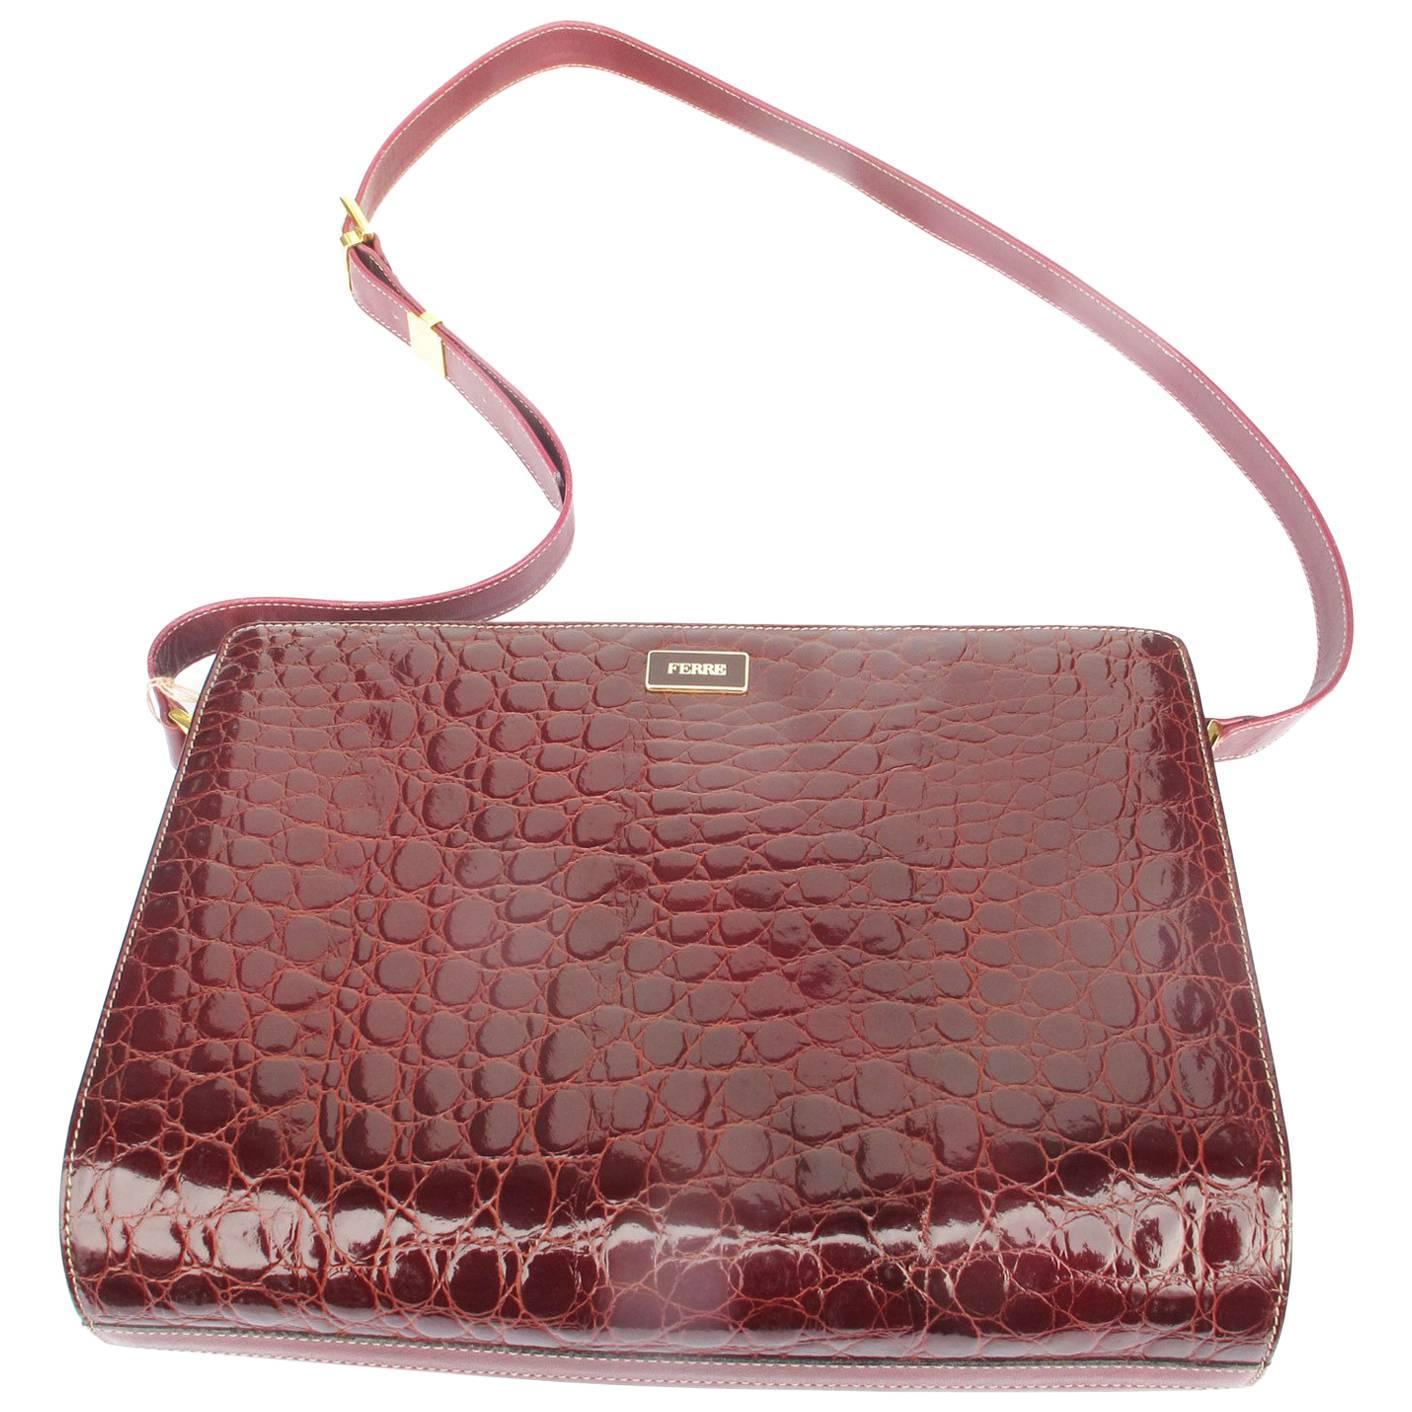 1stdibs 1980s Caramel Crocodile Leather Shoulder Bag 1tHEXUi